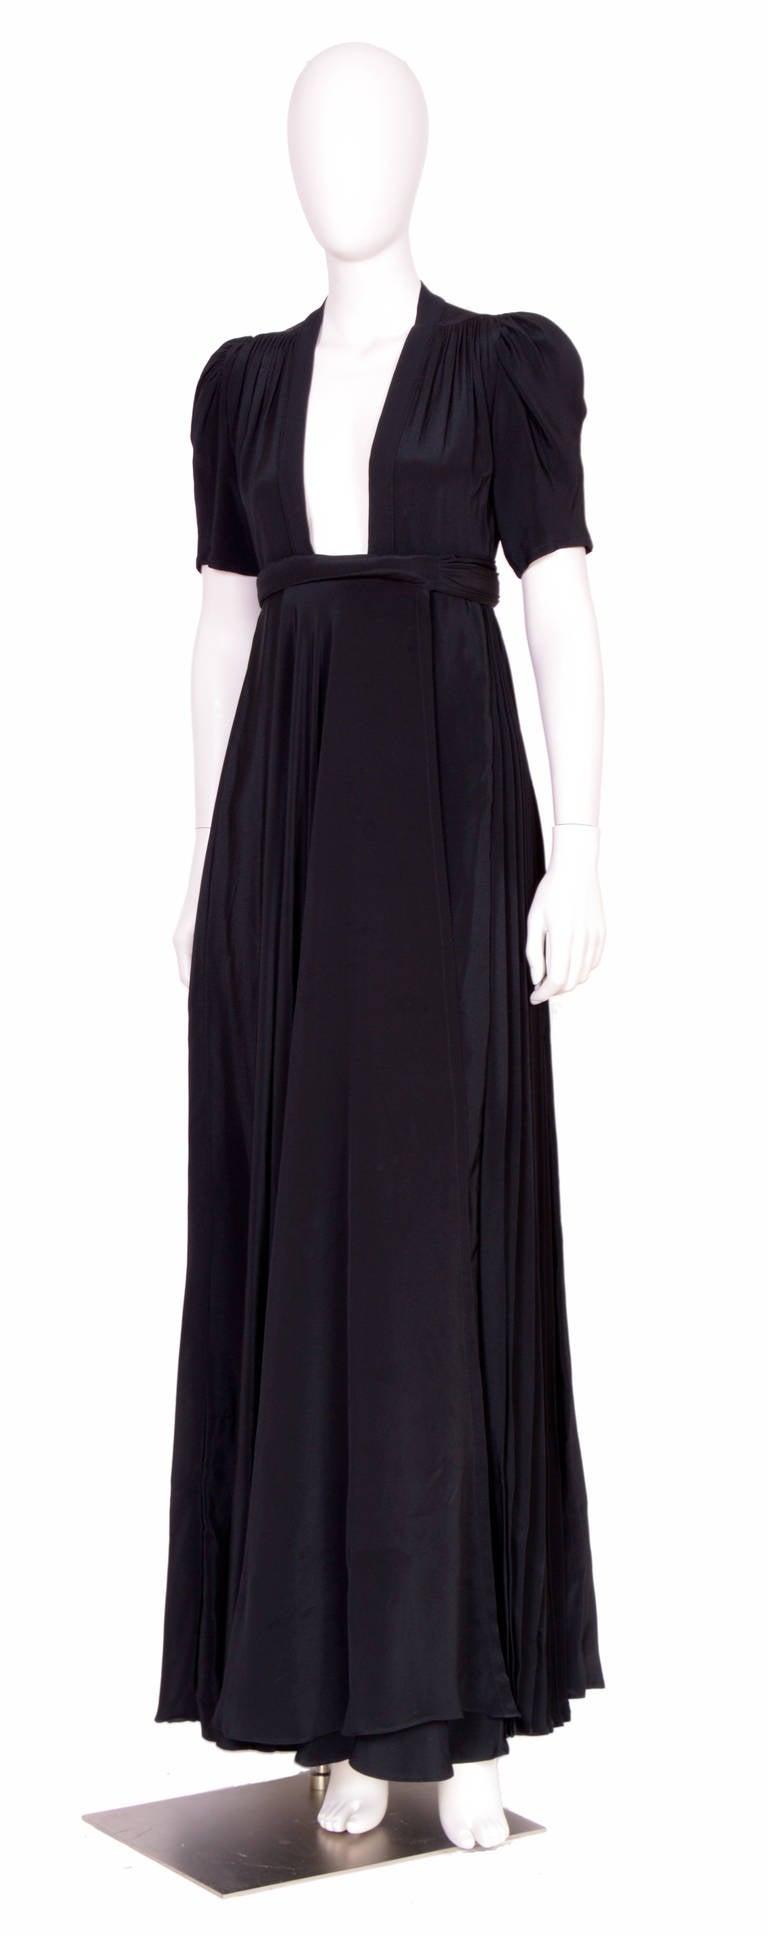 Vintage OSSIE CLARK for QUORUM Black Wrap Dress 2